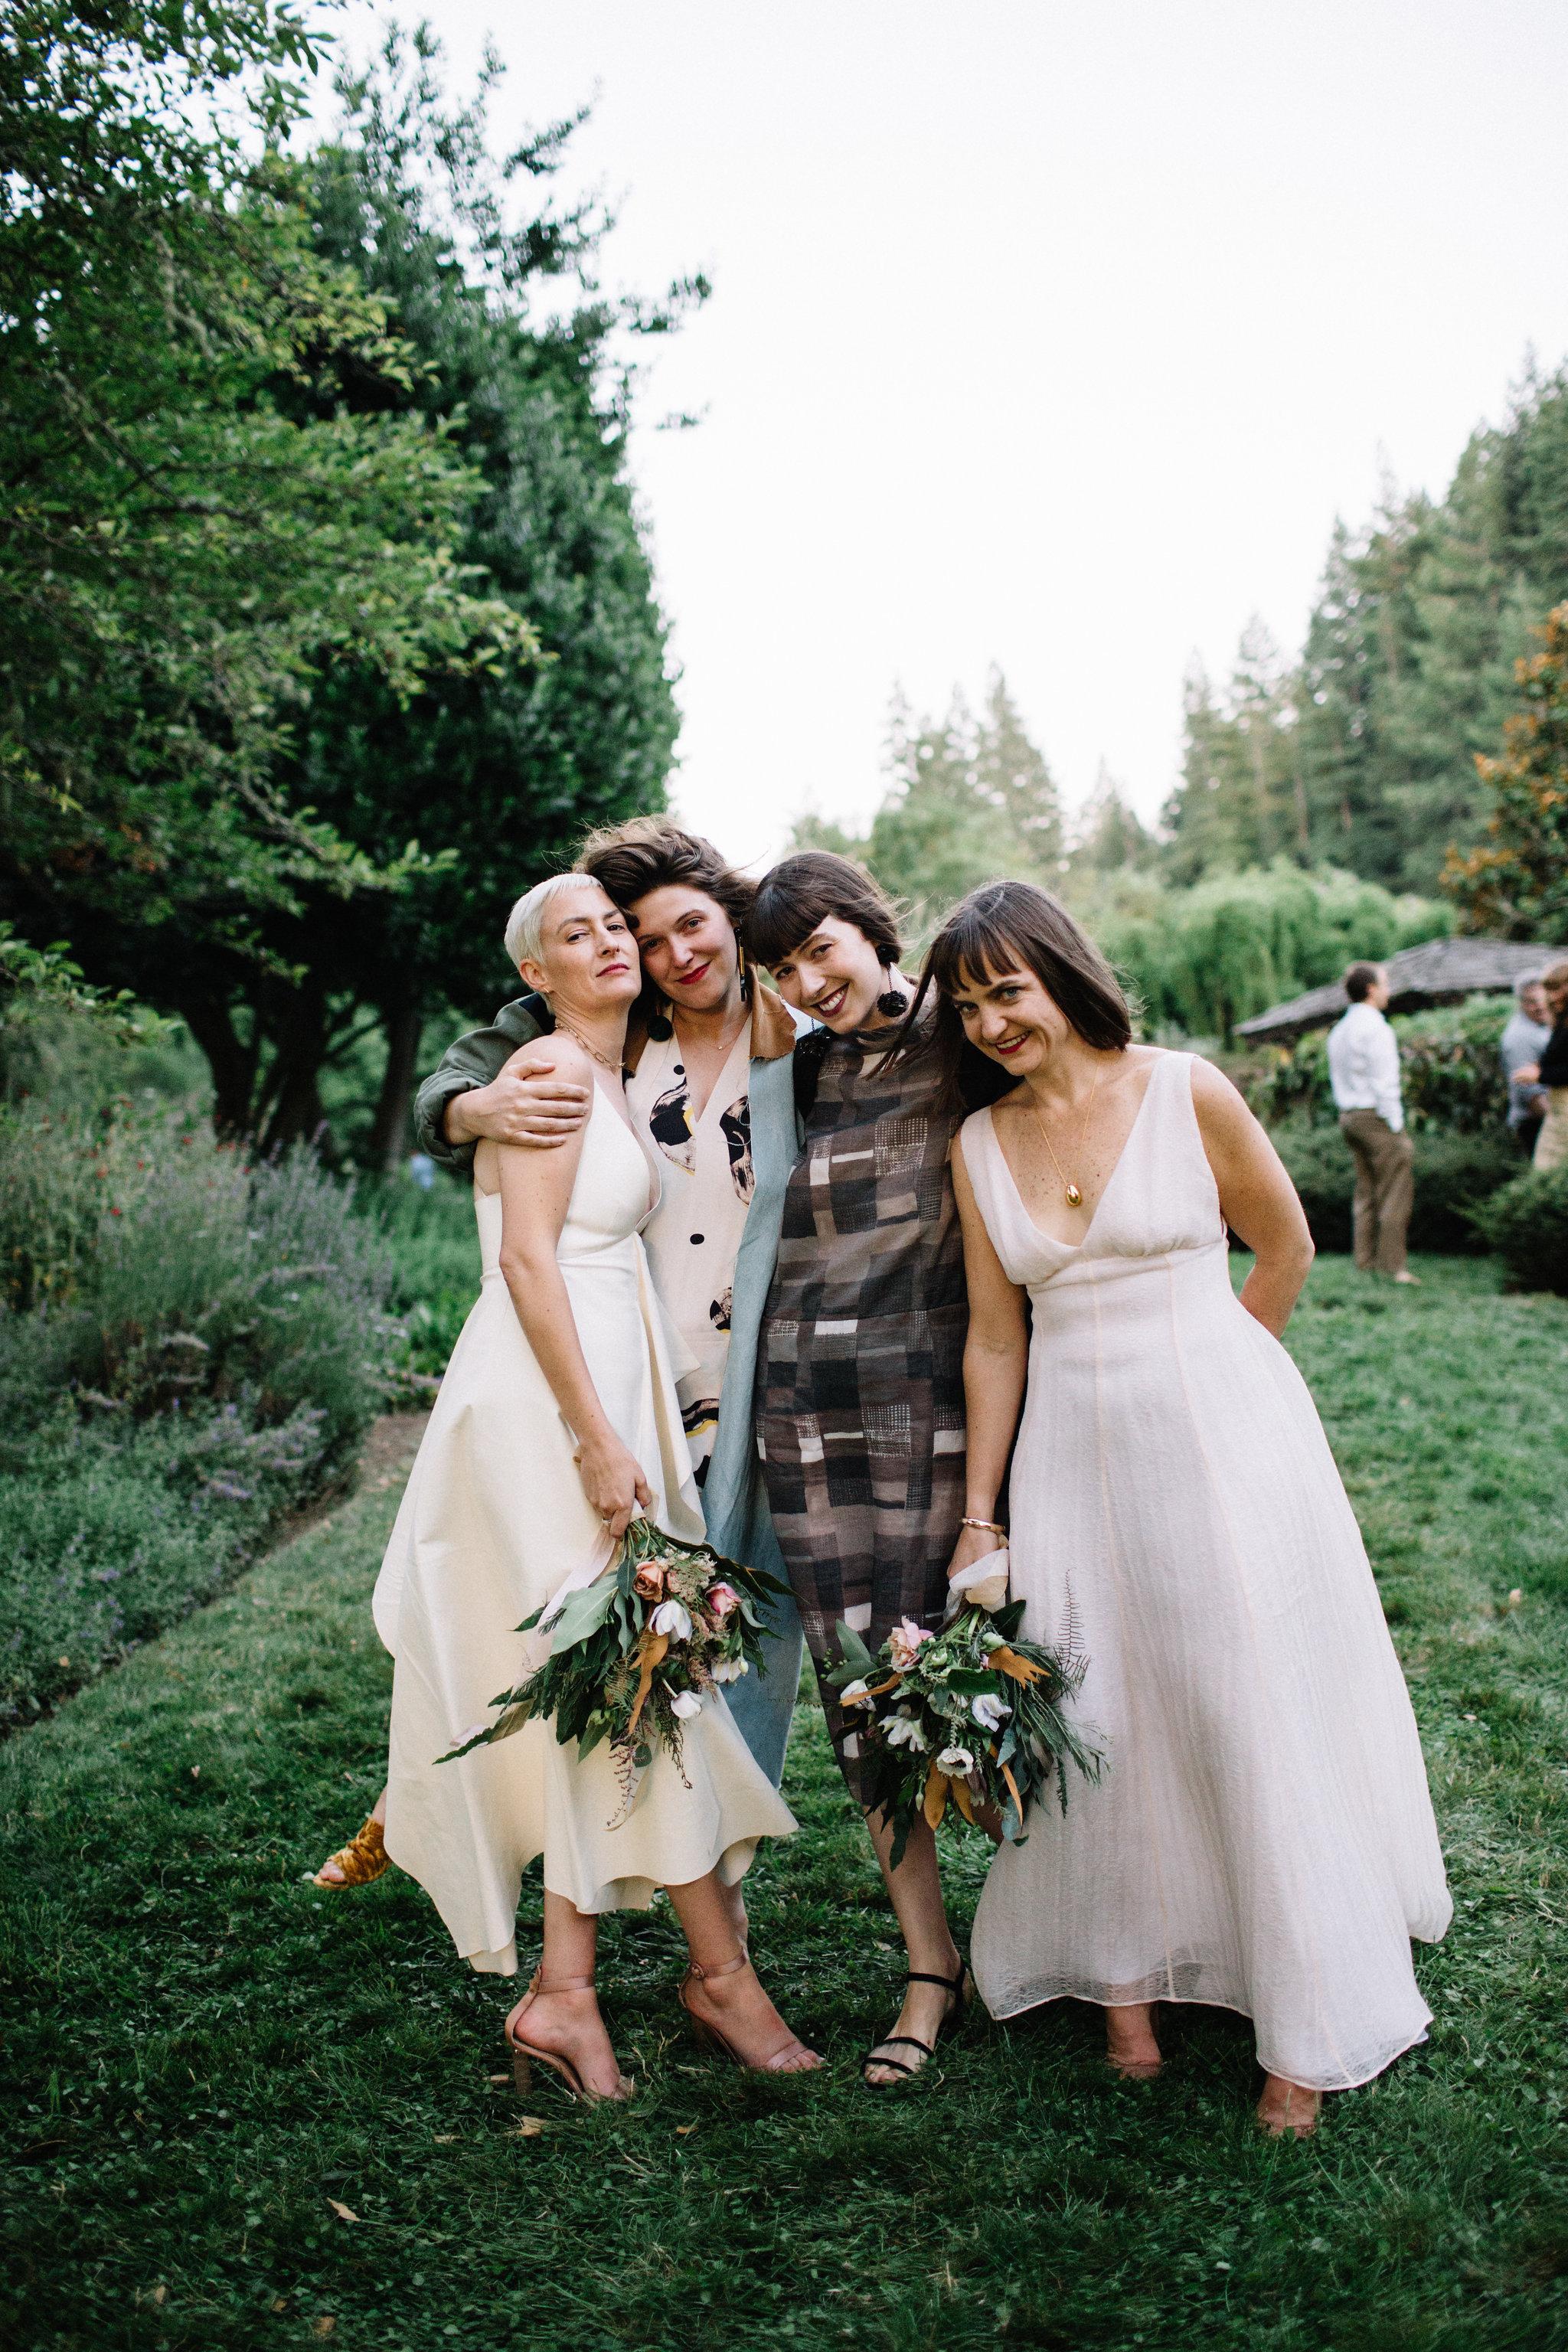 20170708_Brook+Evans_wedding_highres-546.jpg